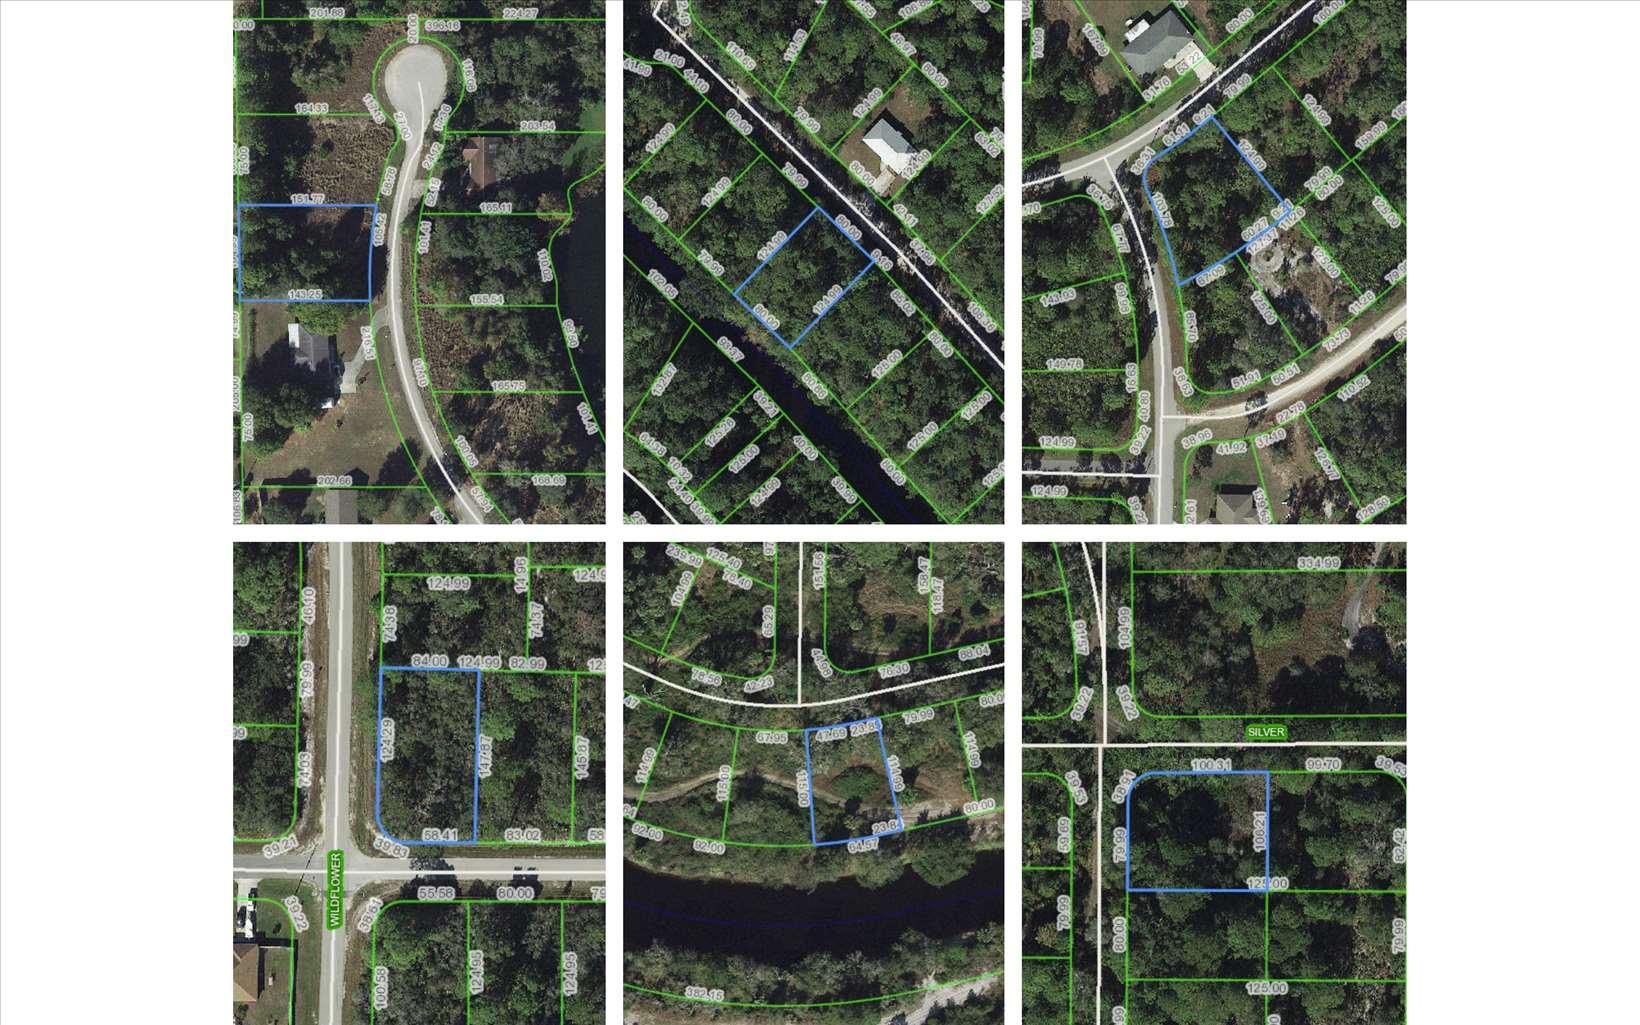 4809 Sebring Lakes Blvd, Sebring, FL 33875